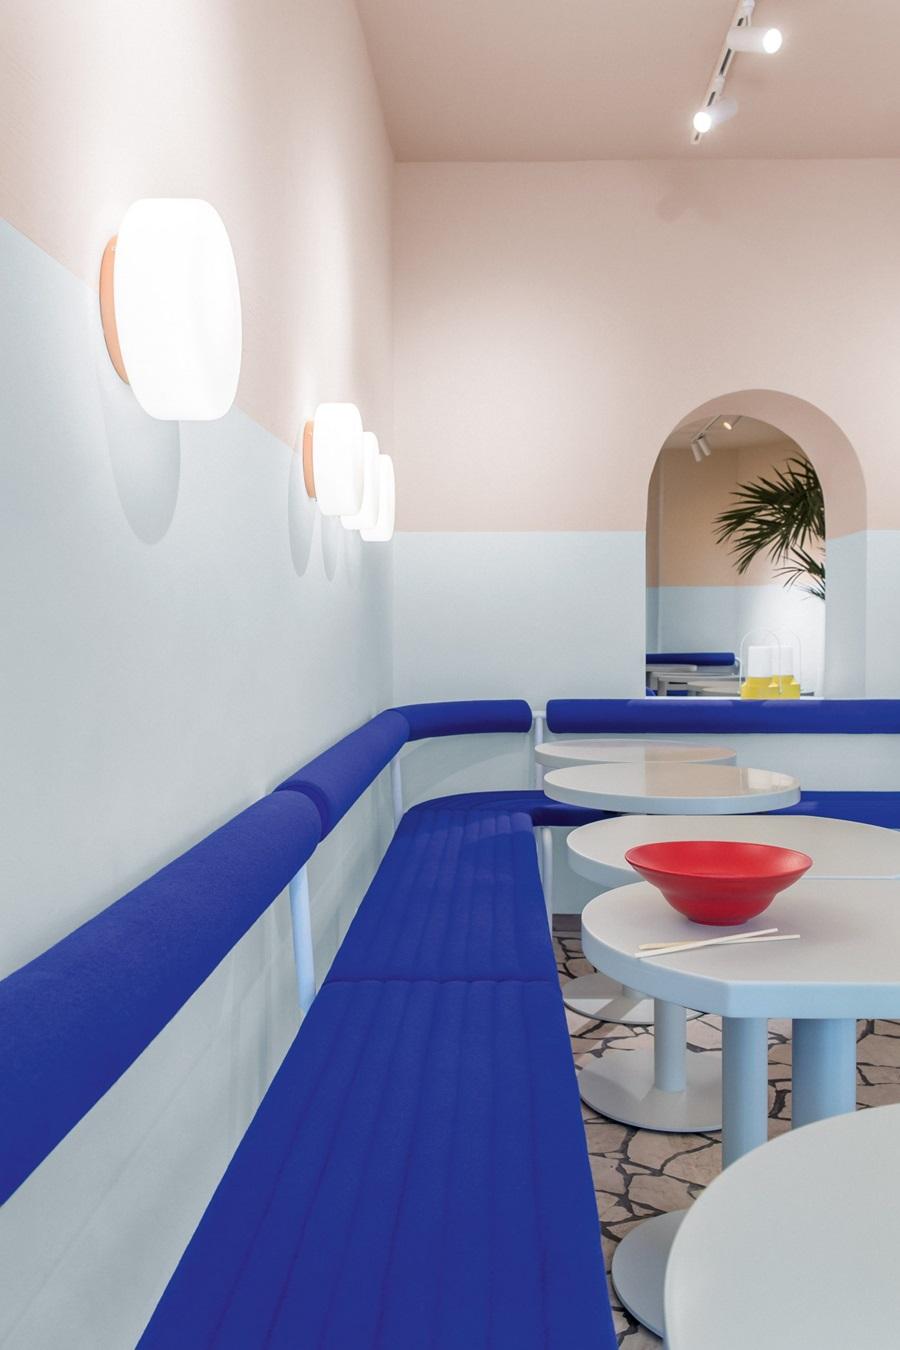 Berlińska restauracja jak z obrazu Davida Hockneya